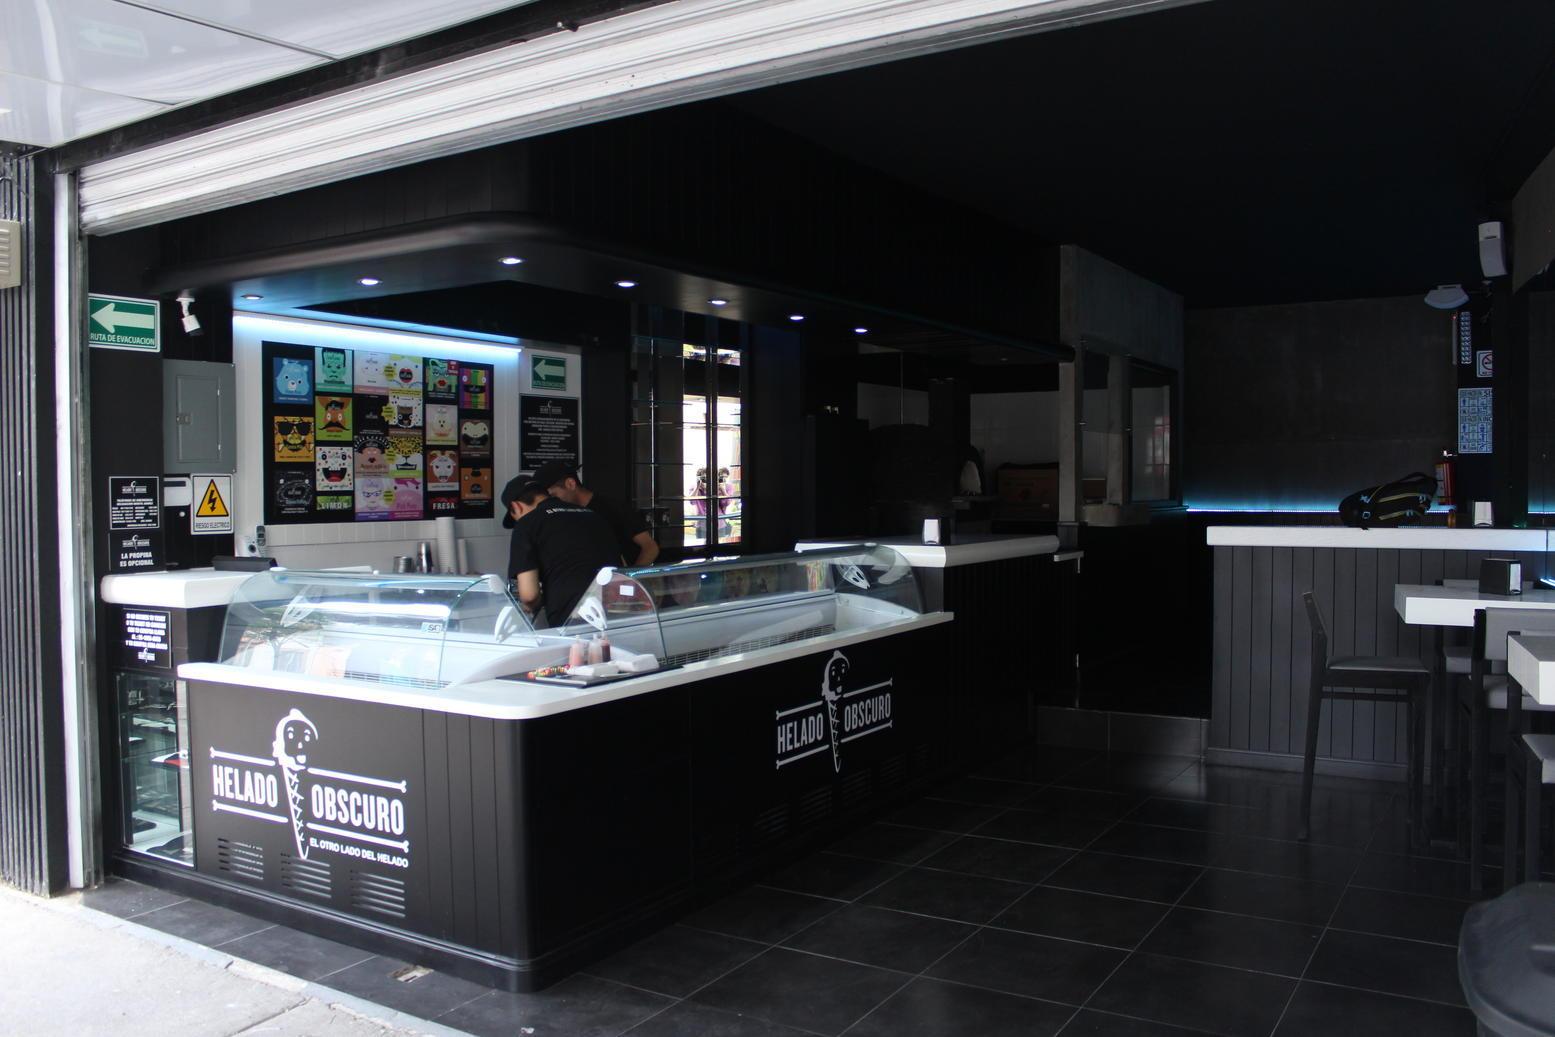 pizzeria helado obscuro